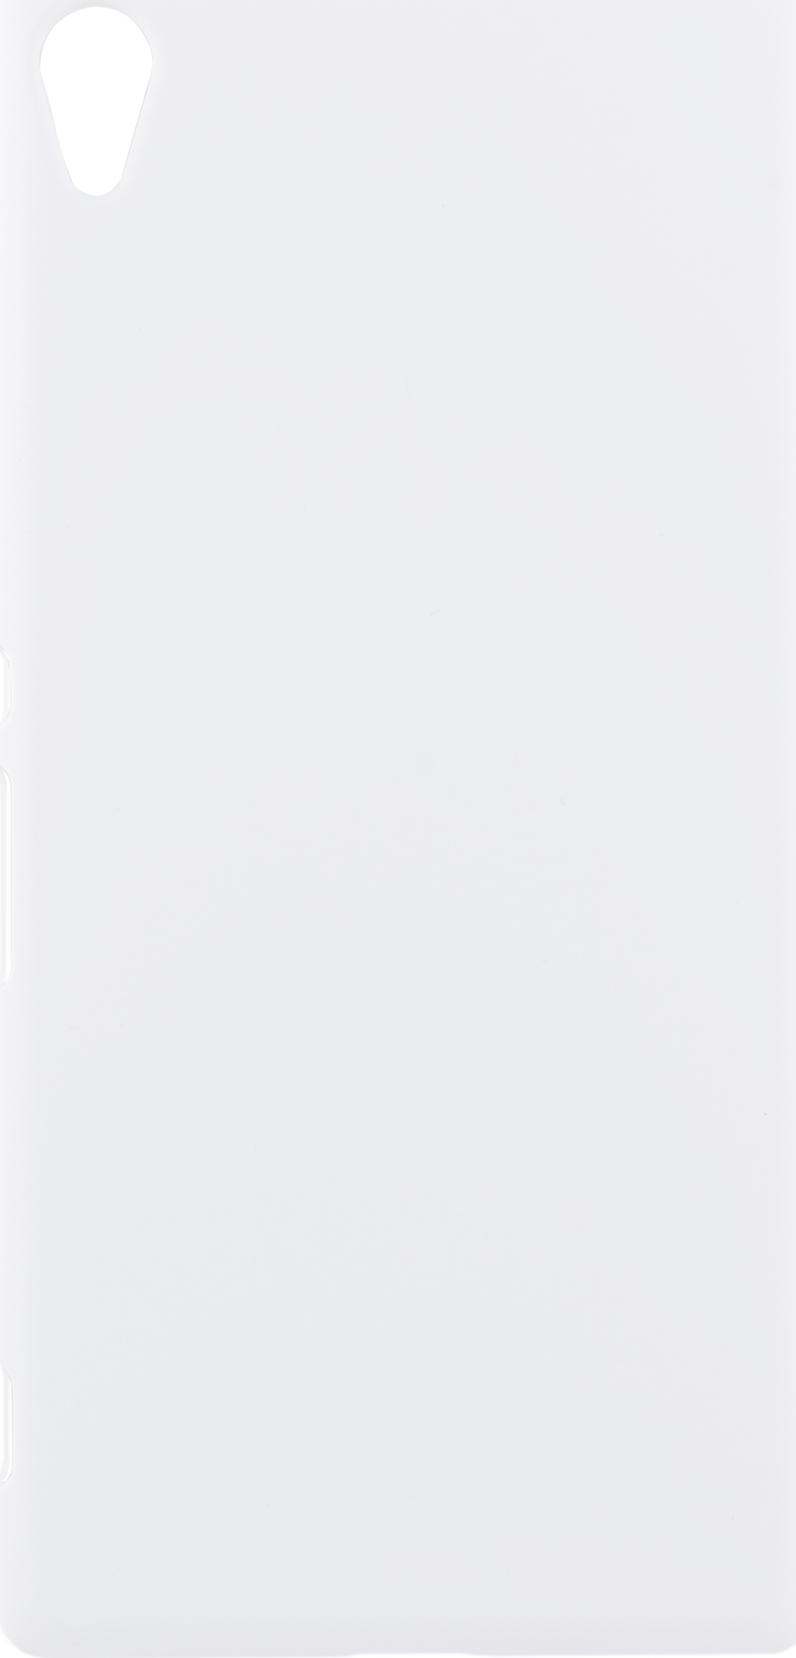 Чехол Brosco Soft-Touch для Sony Xperia XA Ultra, белый чехол книжка gresso канцлер для sony xperia xa ultra черный